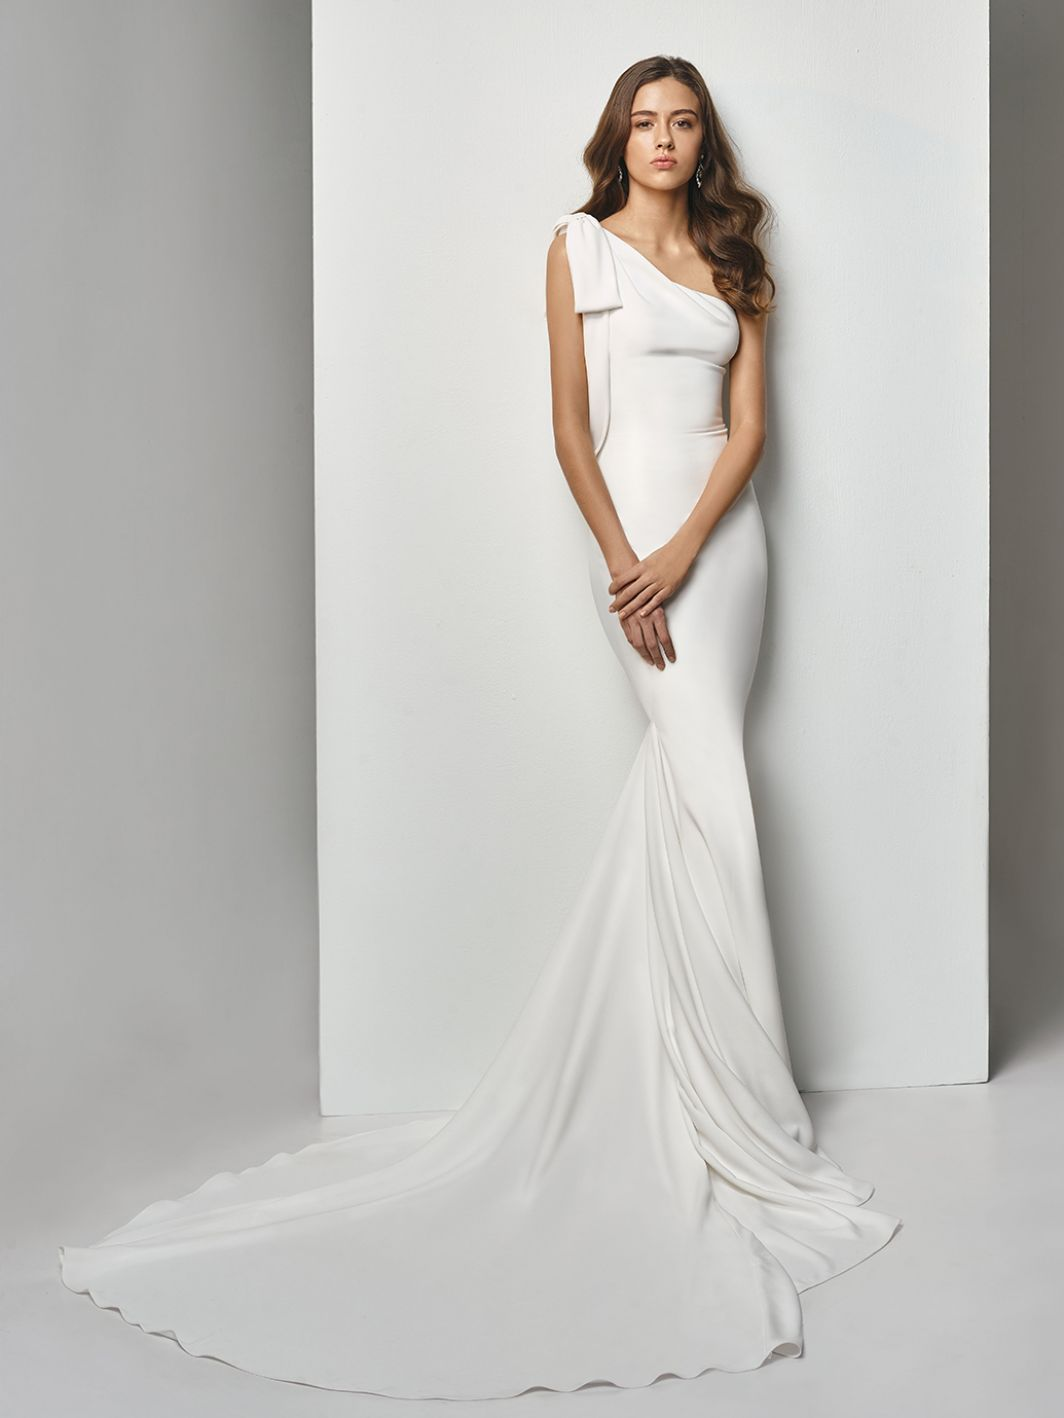 Wedding Dresses For Older Brides.13 Gorgeous Dresses For Older Brides 2019 Edition